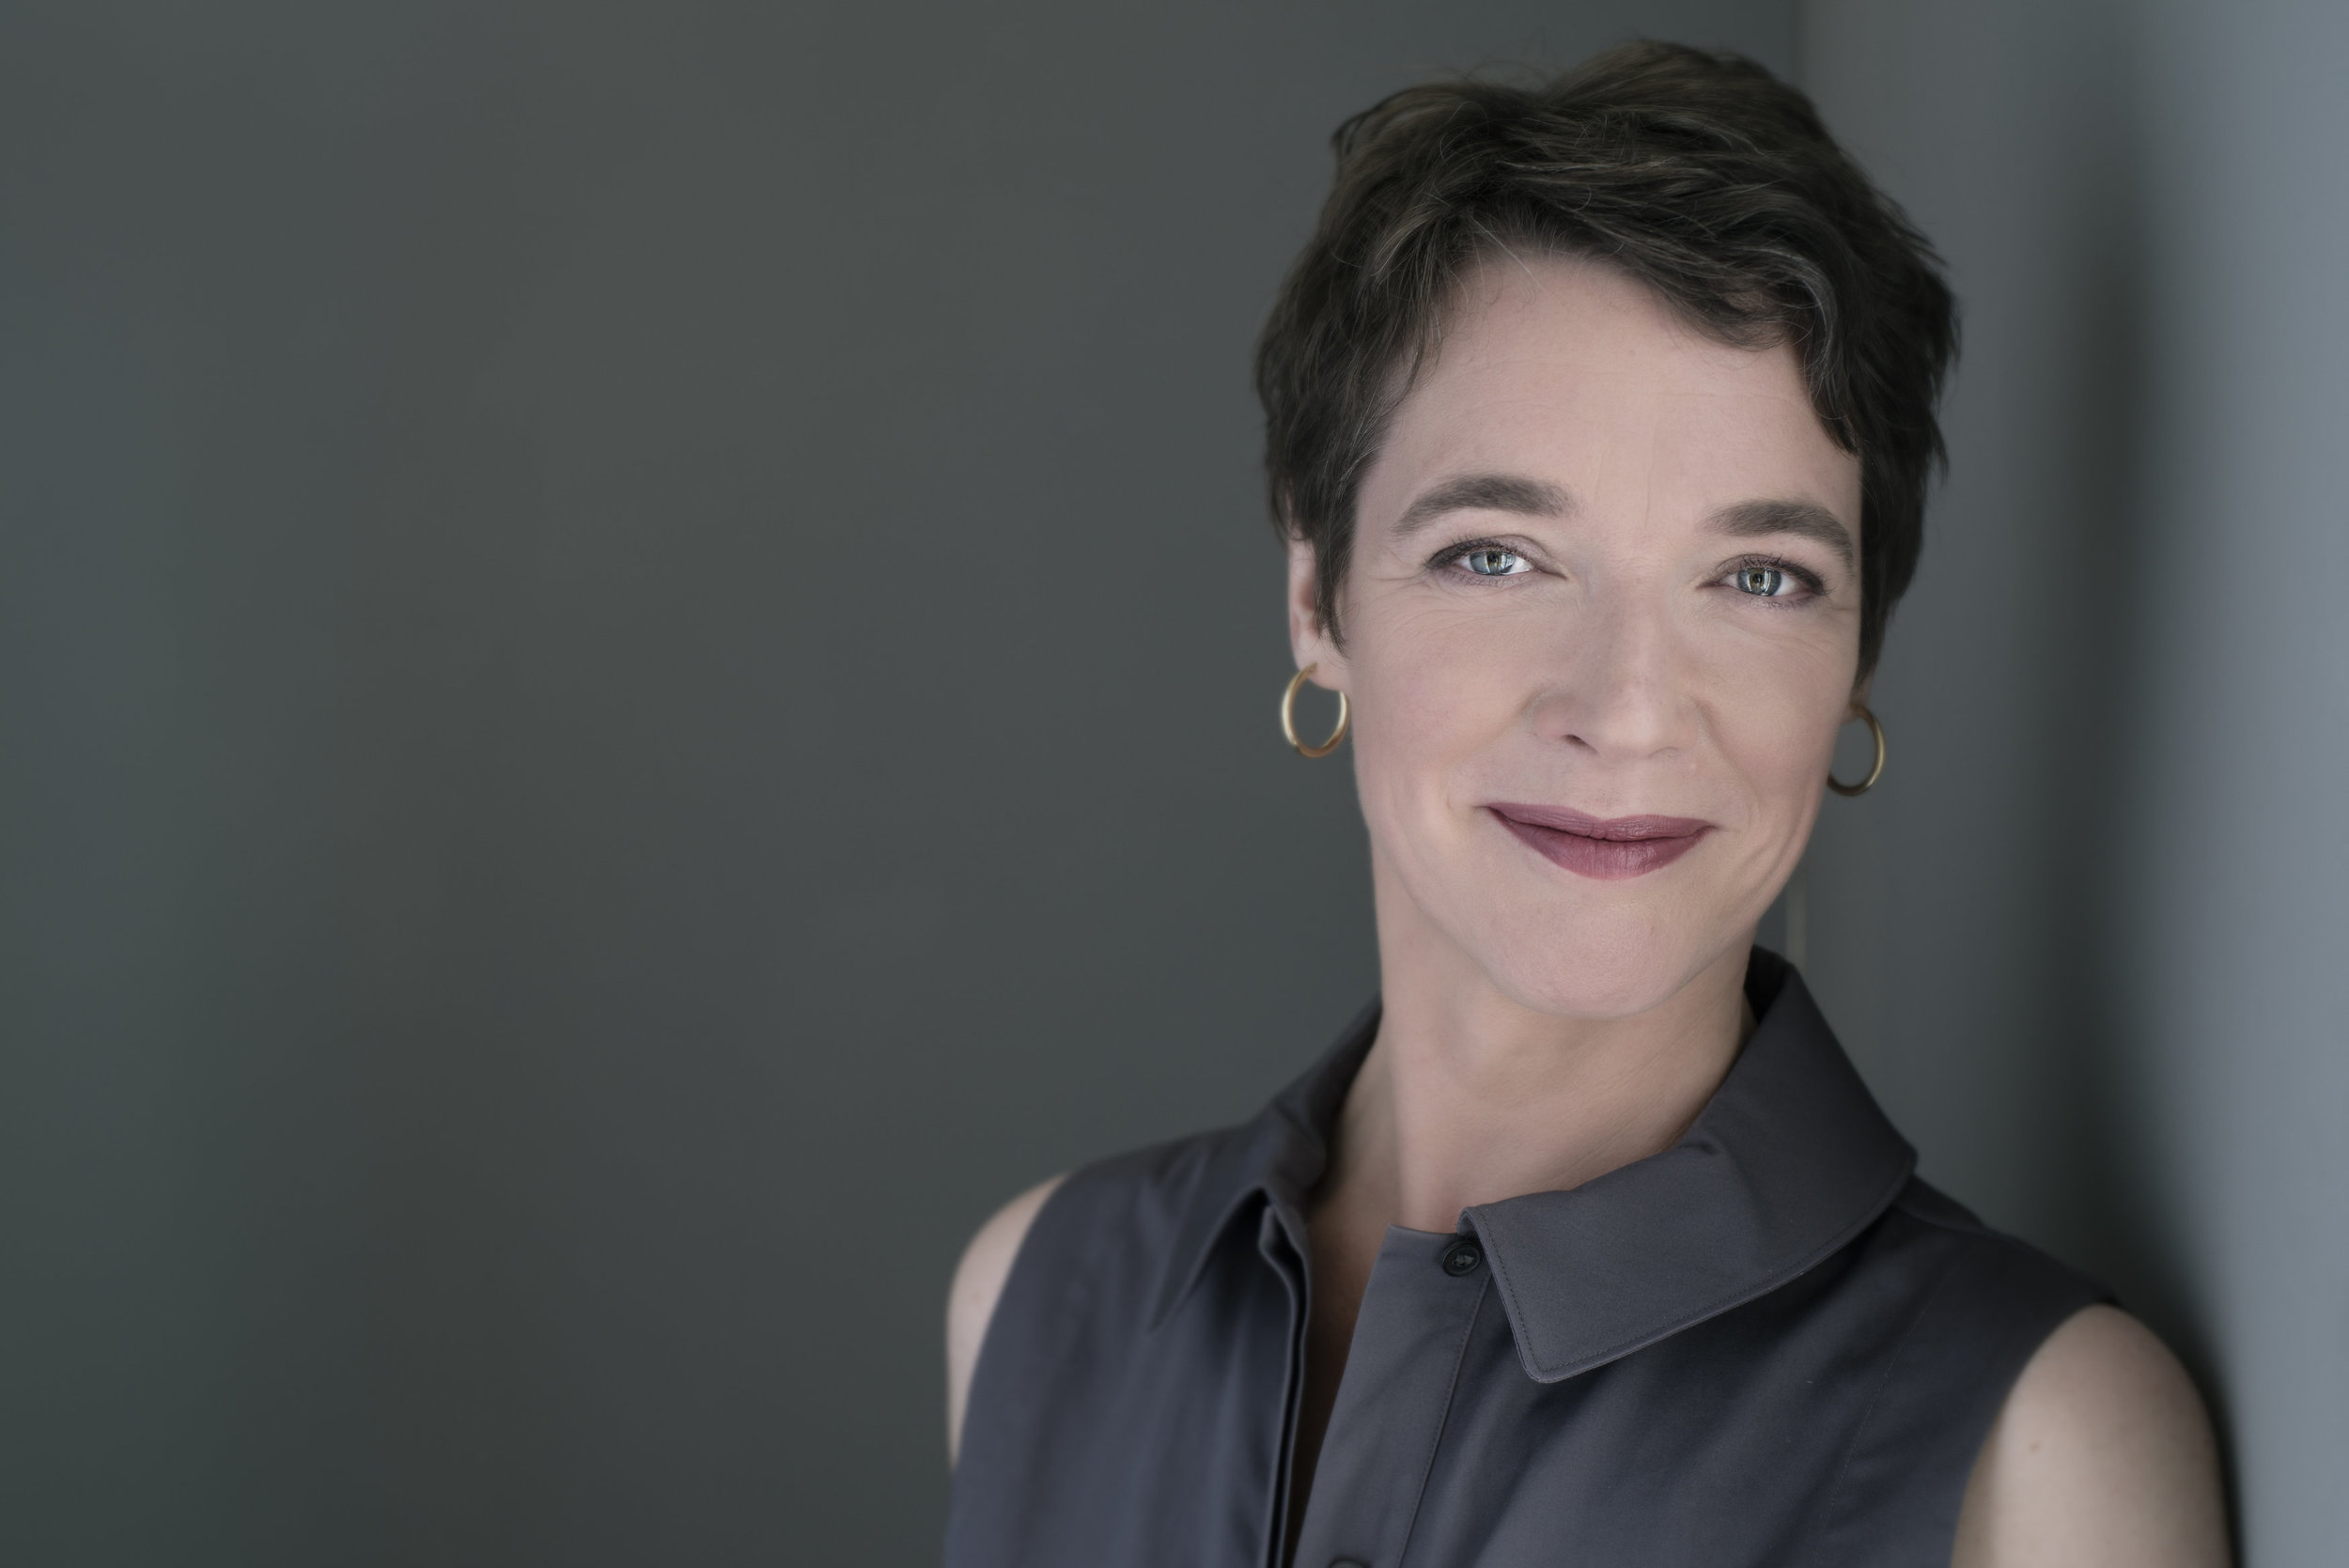 Judith Gussenhoven